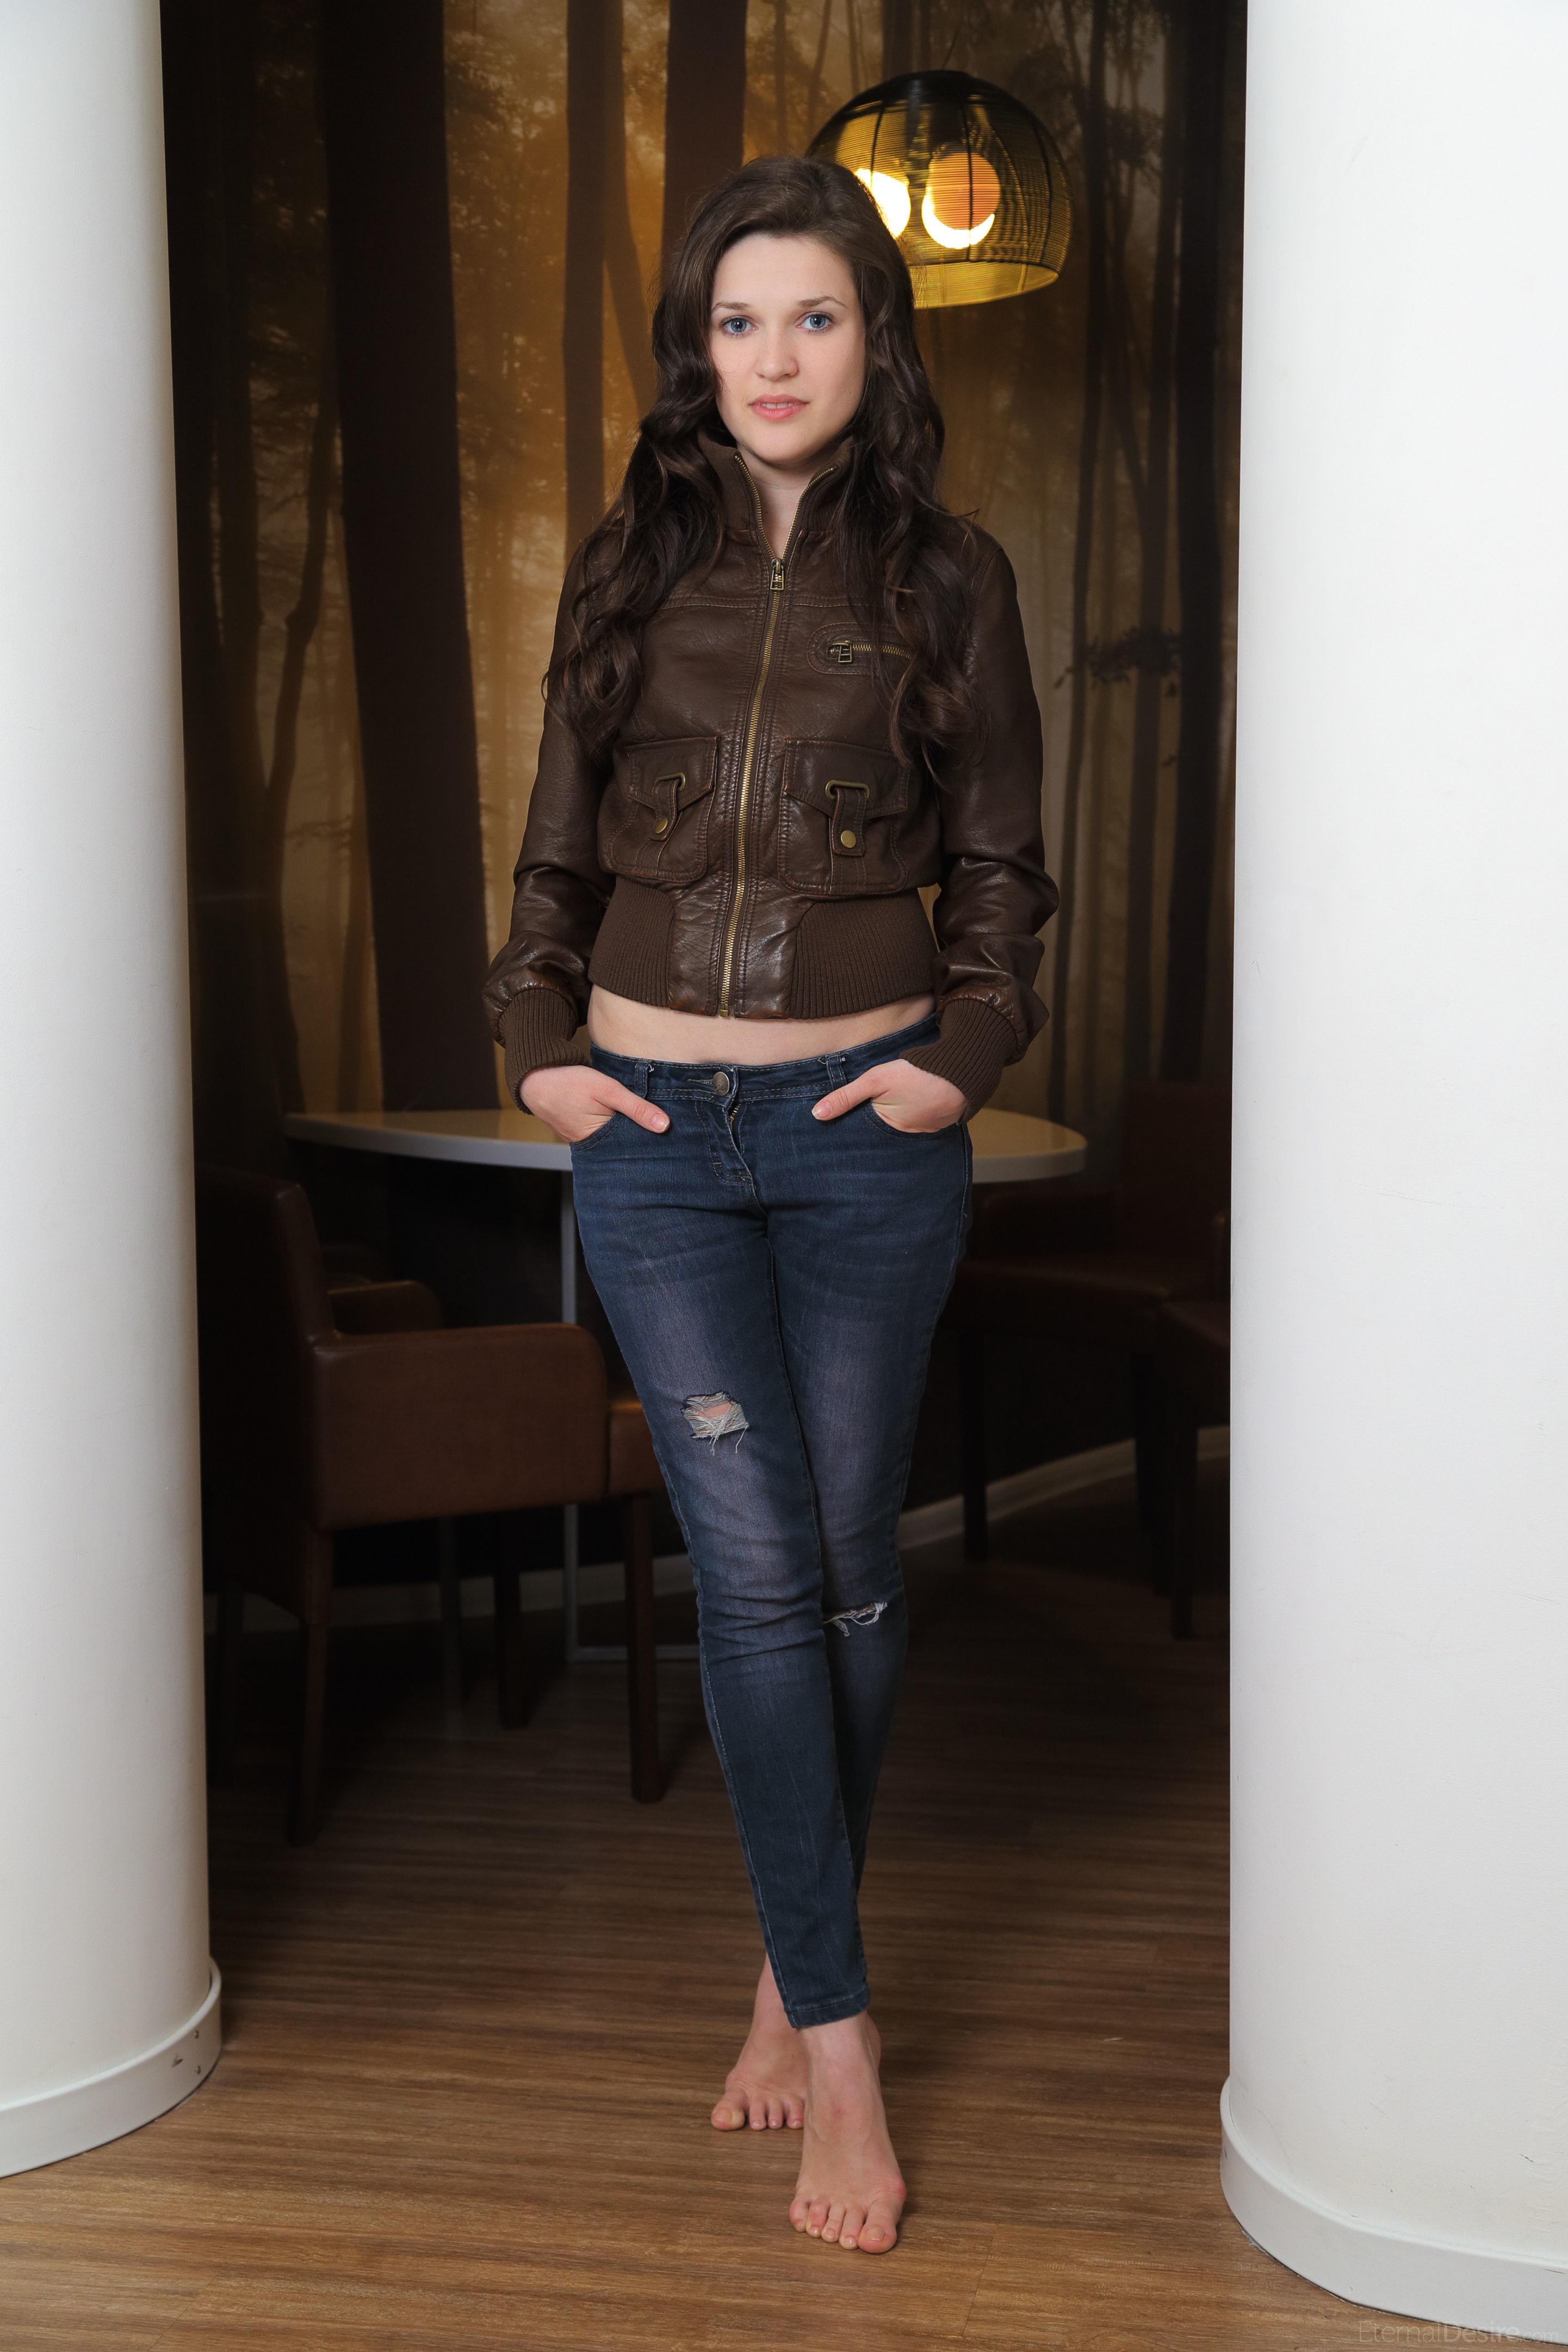 Serena Wood - Hermosa Ucraniana + 7 Si Te Enamoras